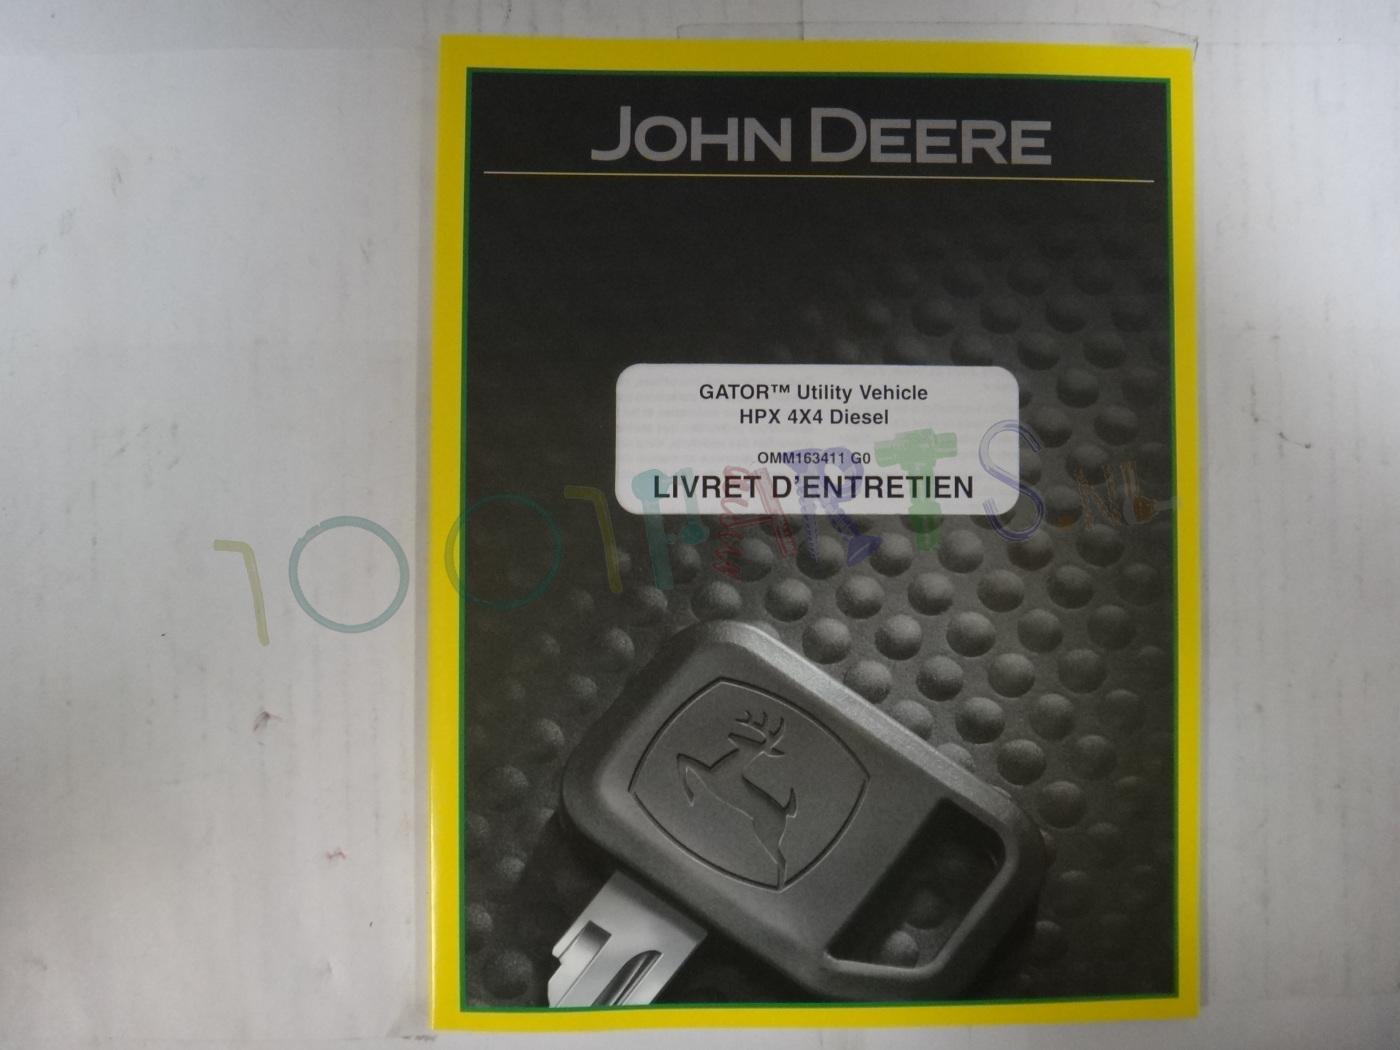 livret dentretien hpx 4x4 francais omm163411 handleiding perkbv john deere diesel koop. Black Bedroom Furniture Sets. Home Design Ideas